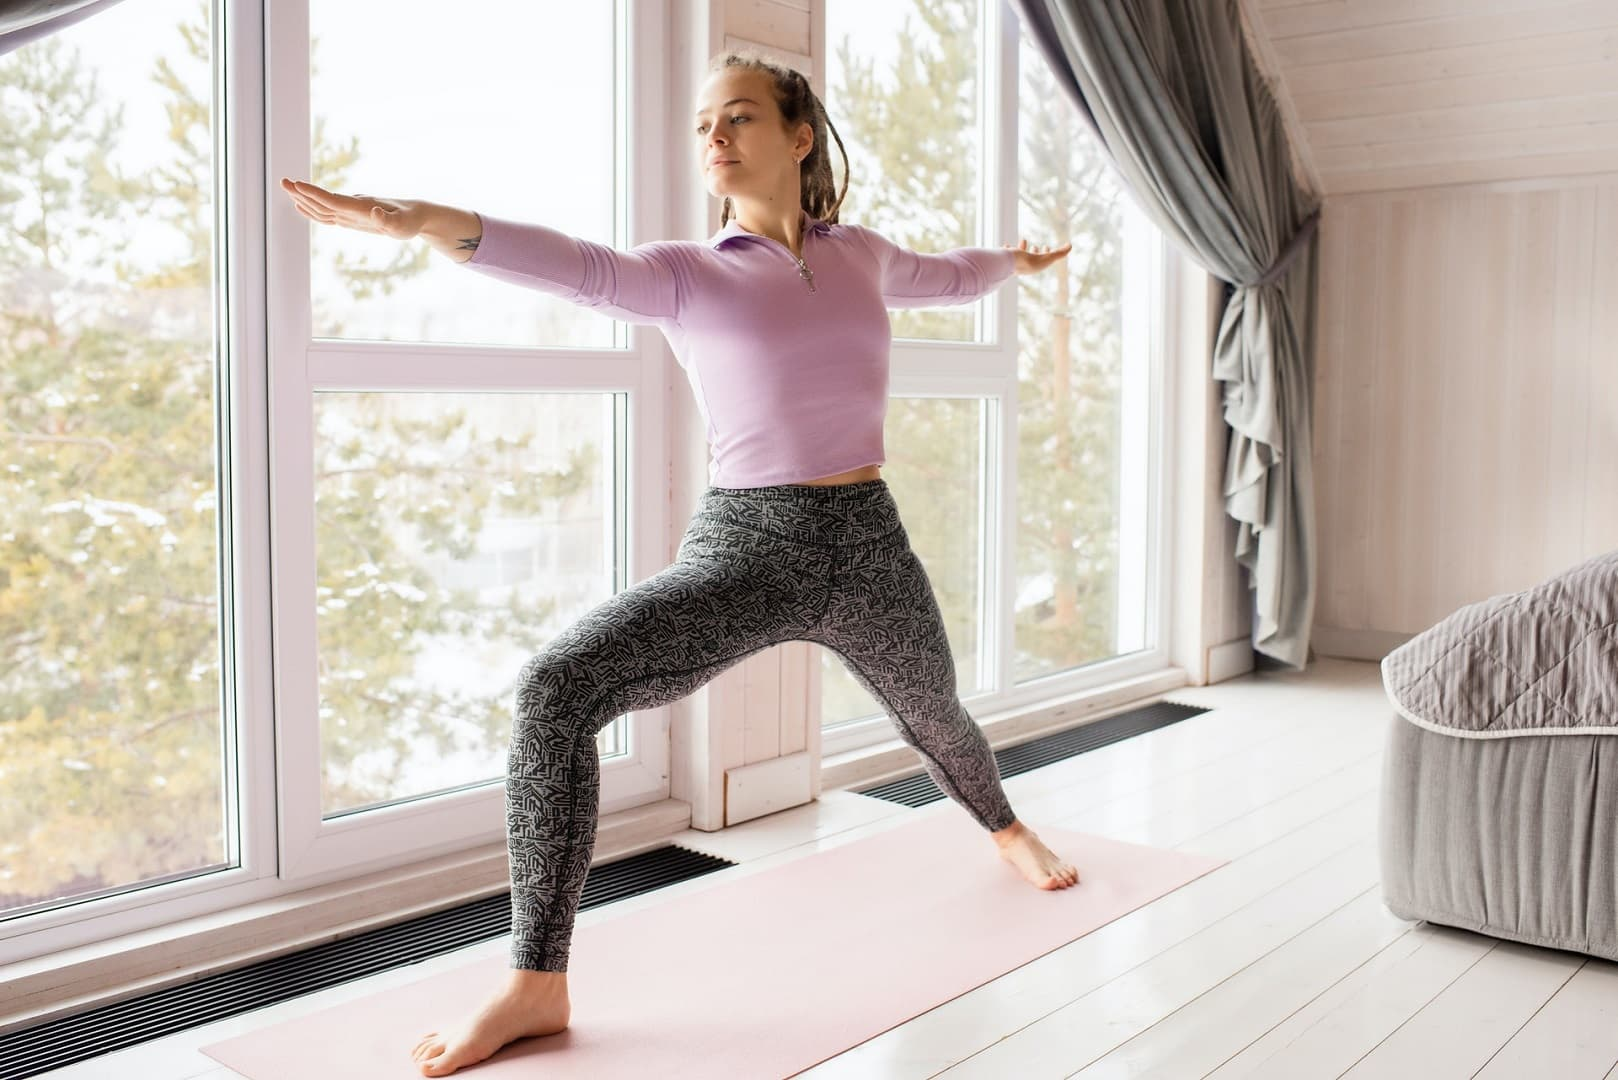 Yoga Online in Australia